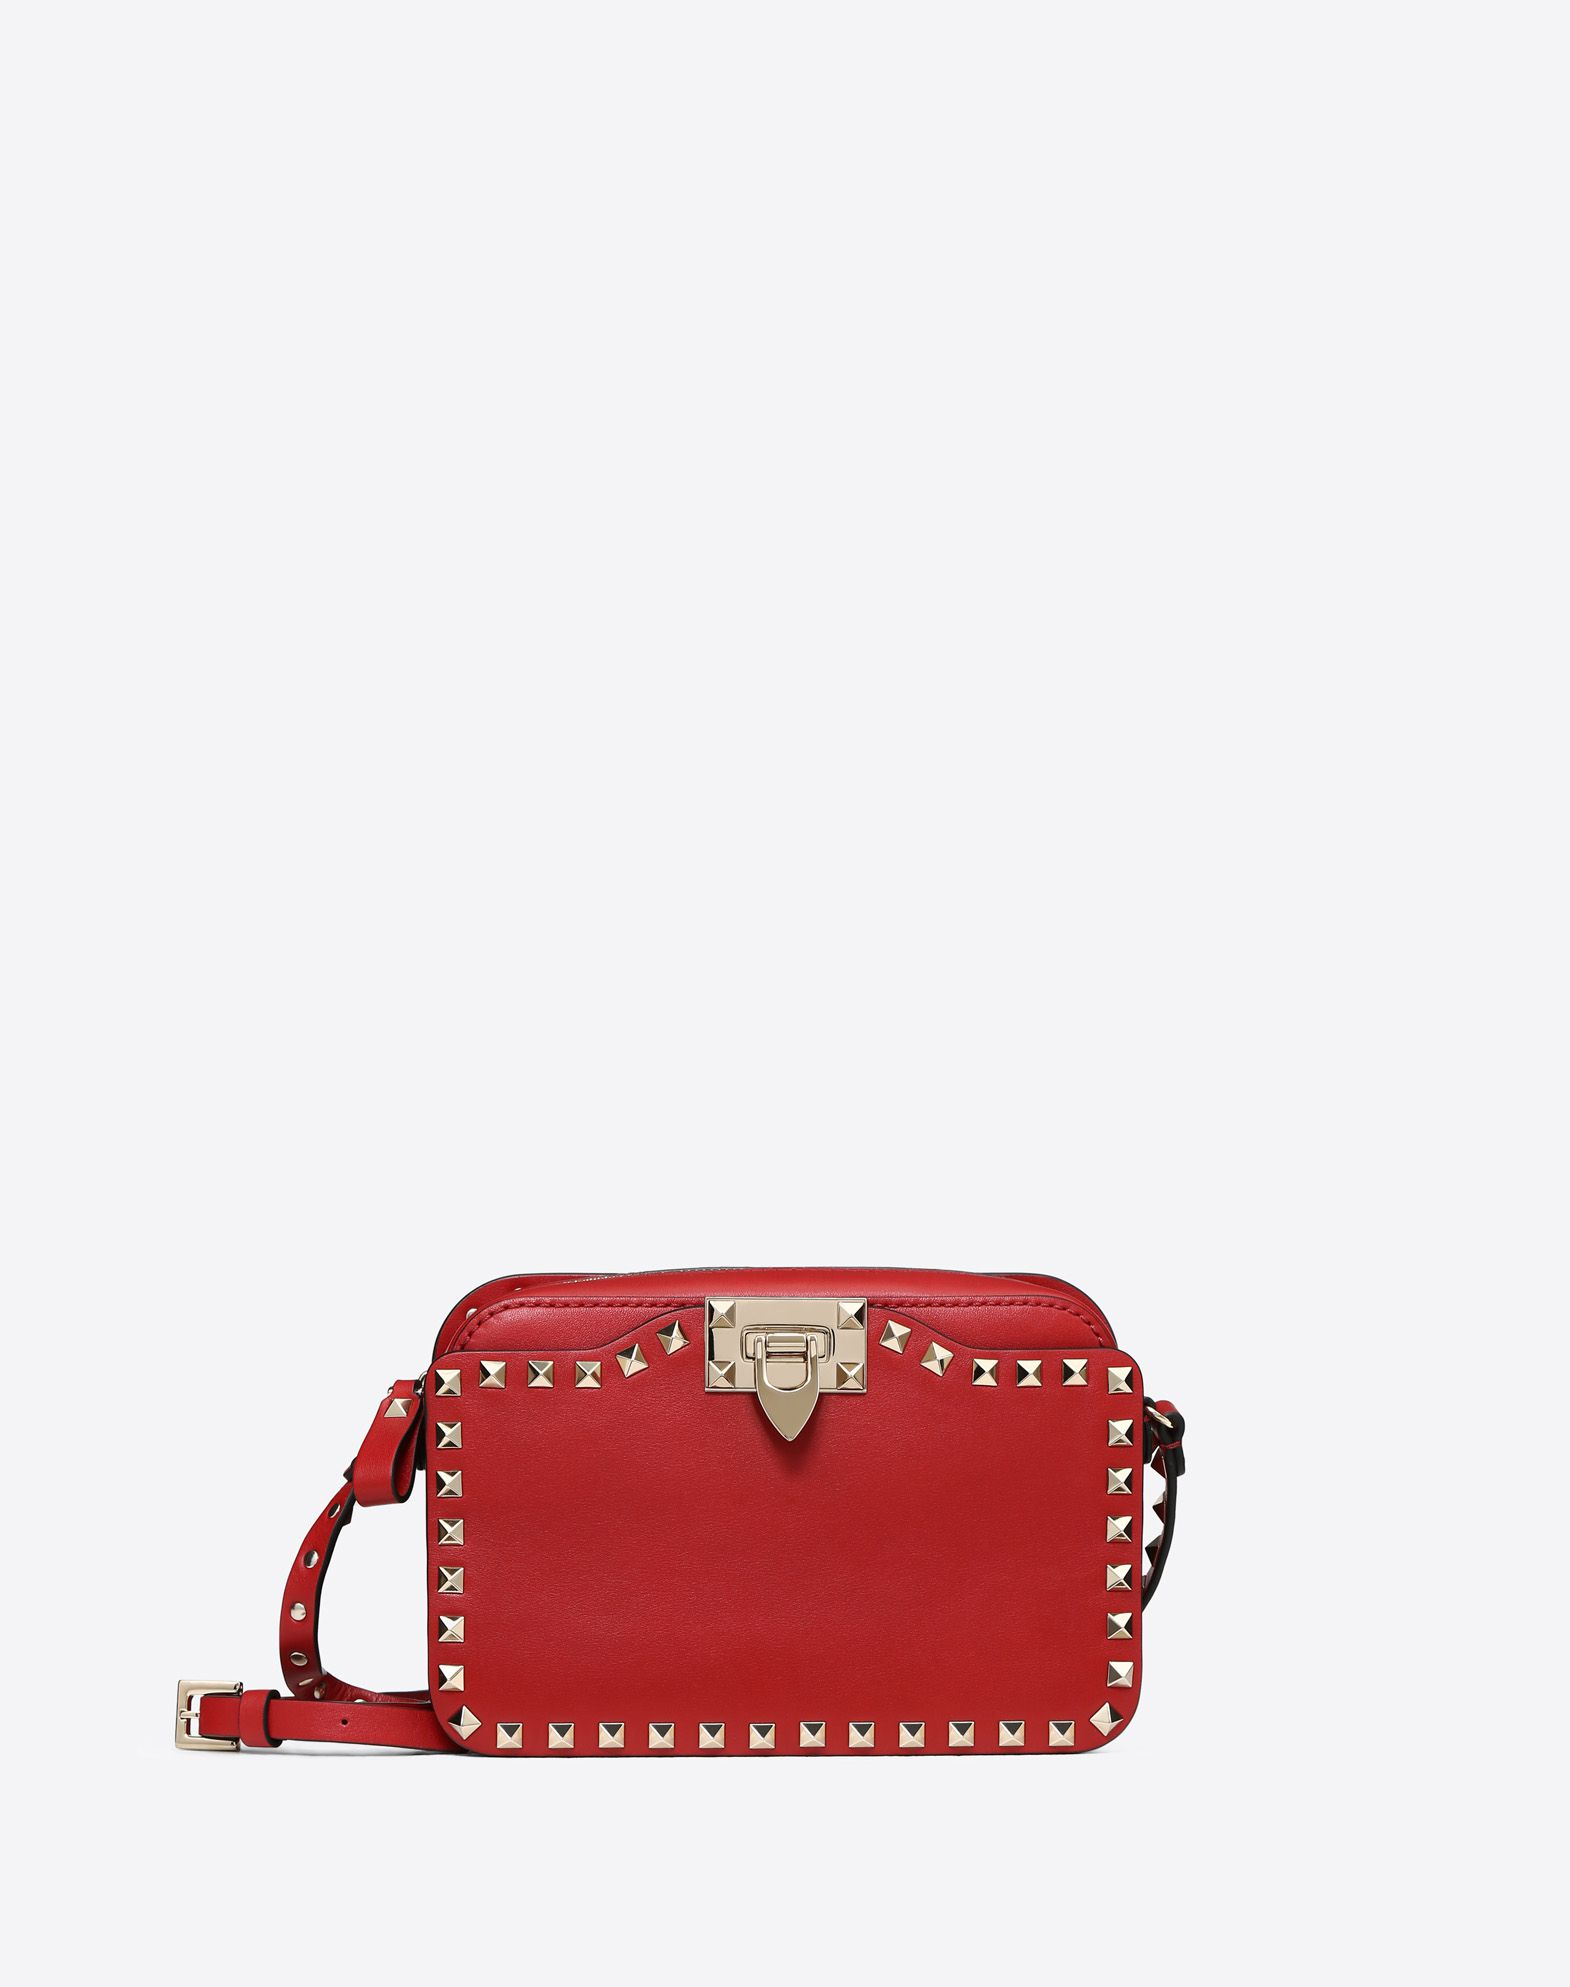 VALENTINO 铆钉 附品牌标志 单色  拉链 外部多口袋 内部口袋 可调式背带  45330810ks